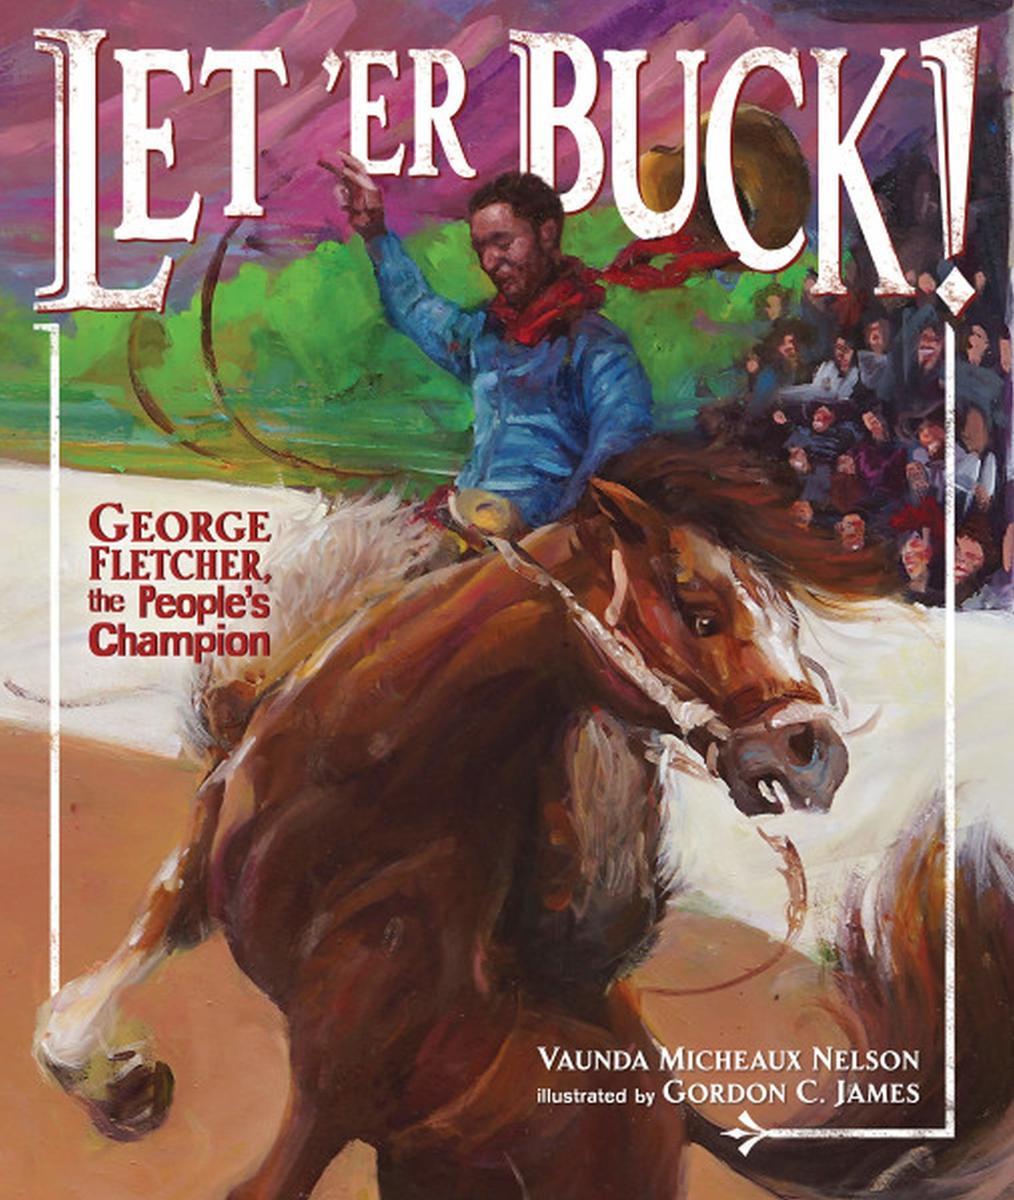 Let 'Er Buck: George Fletcher, the People's Champion by Vaunda Micheaux Nelson